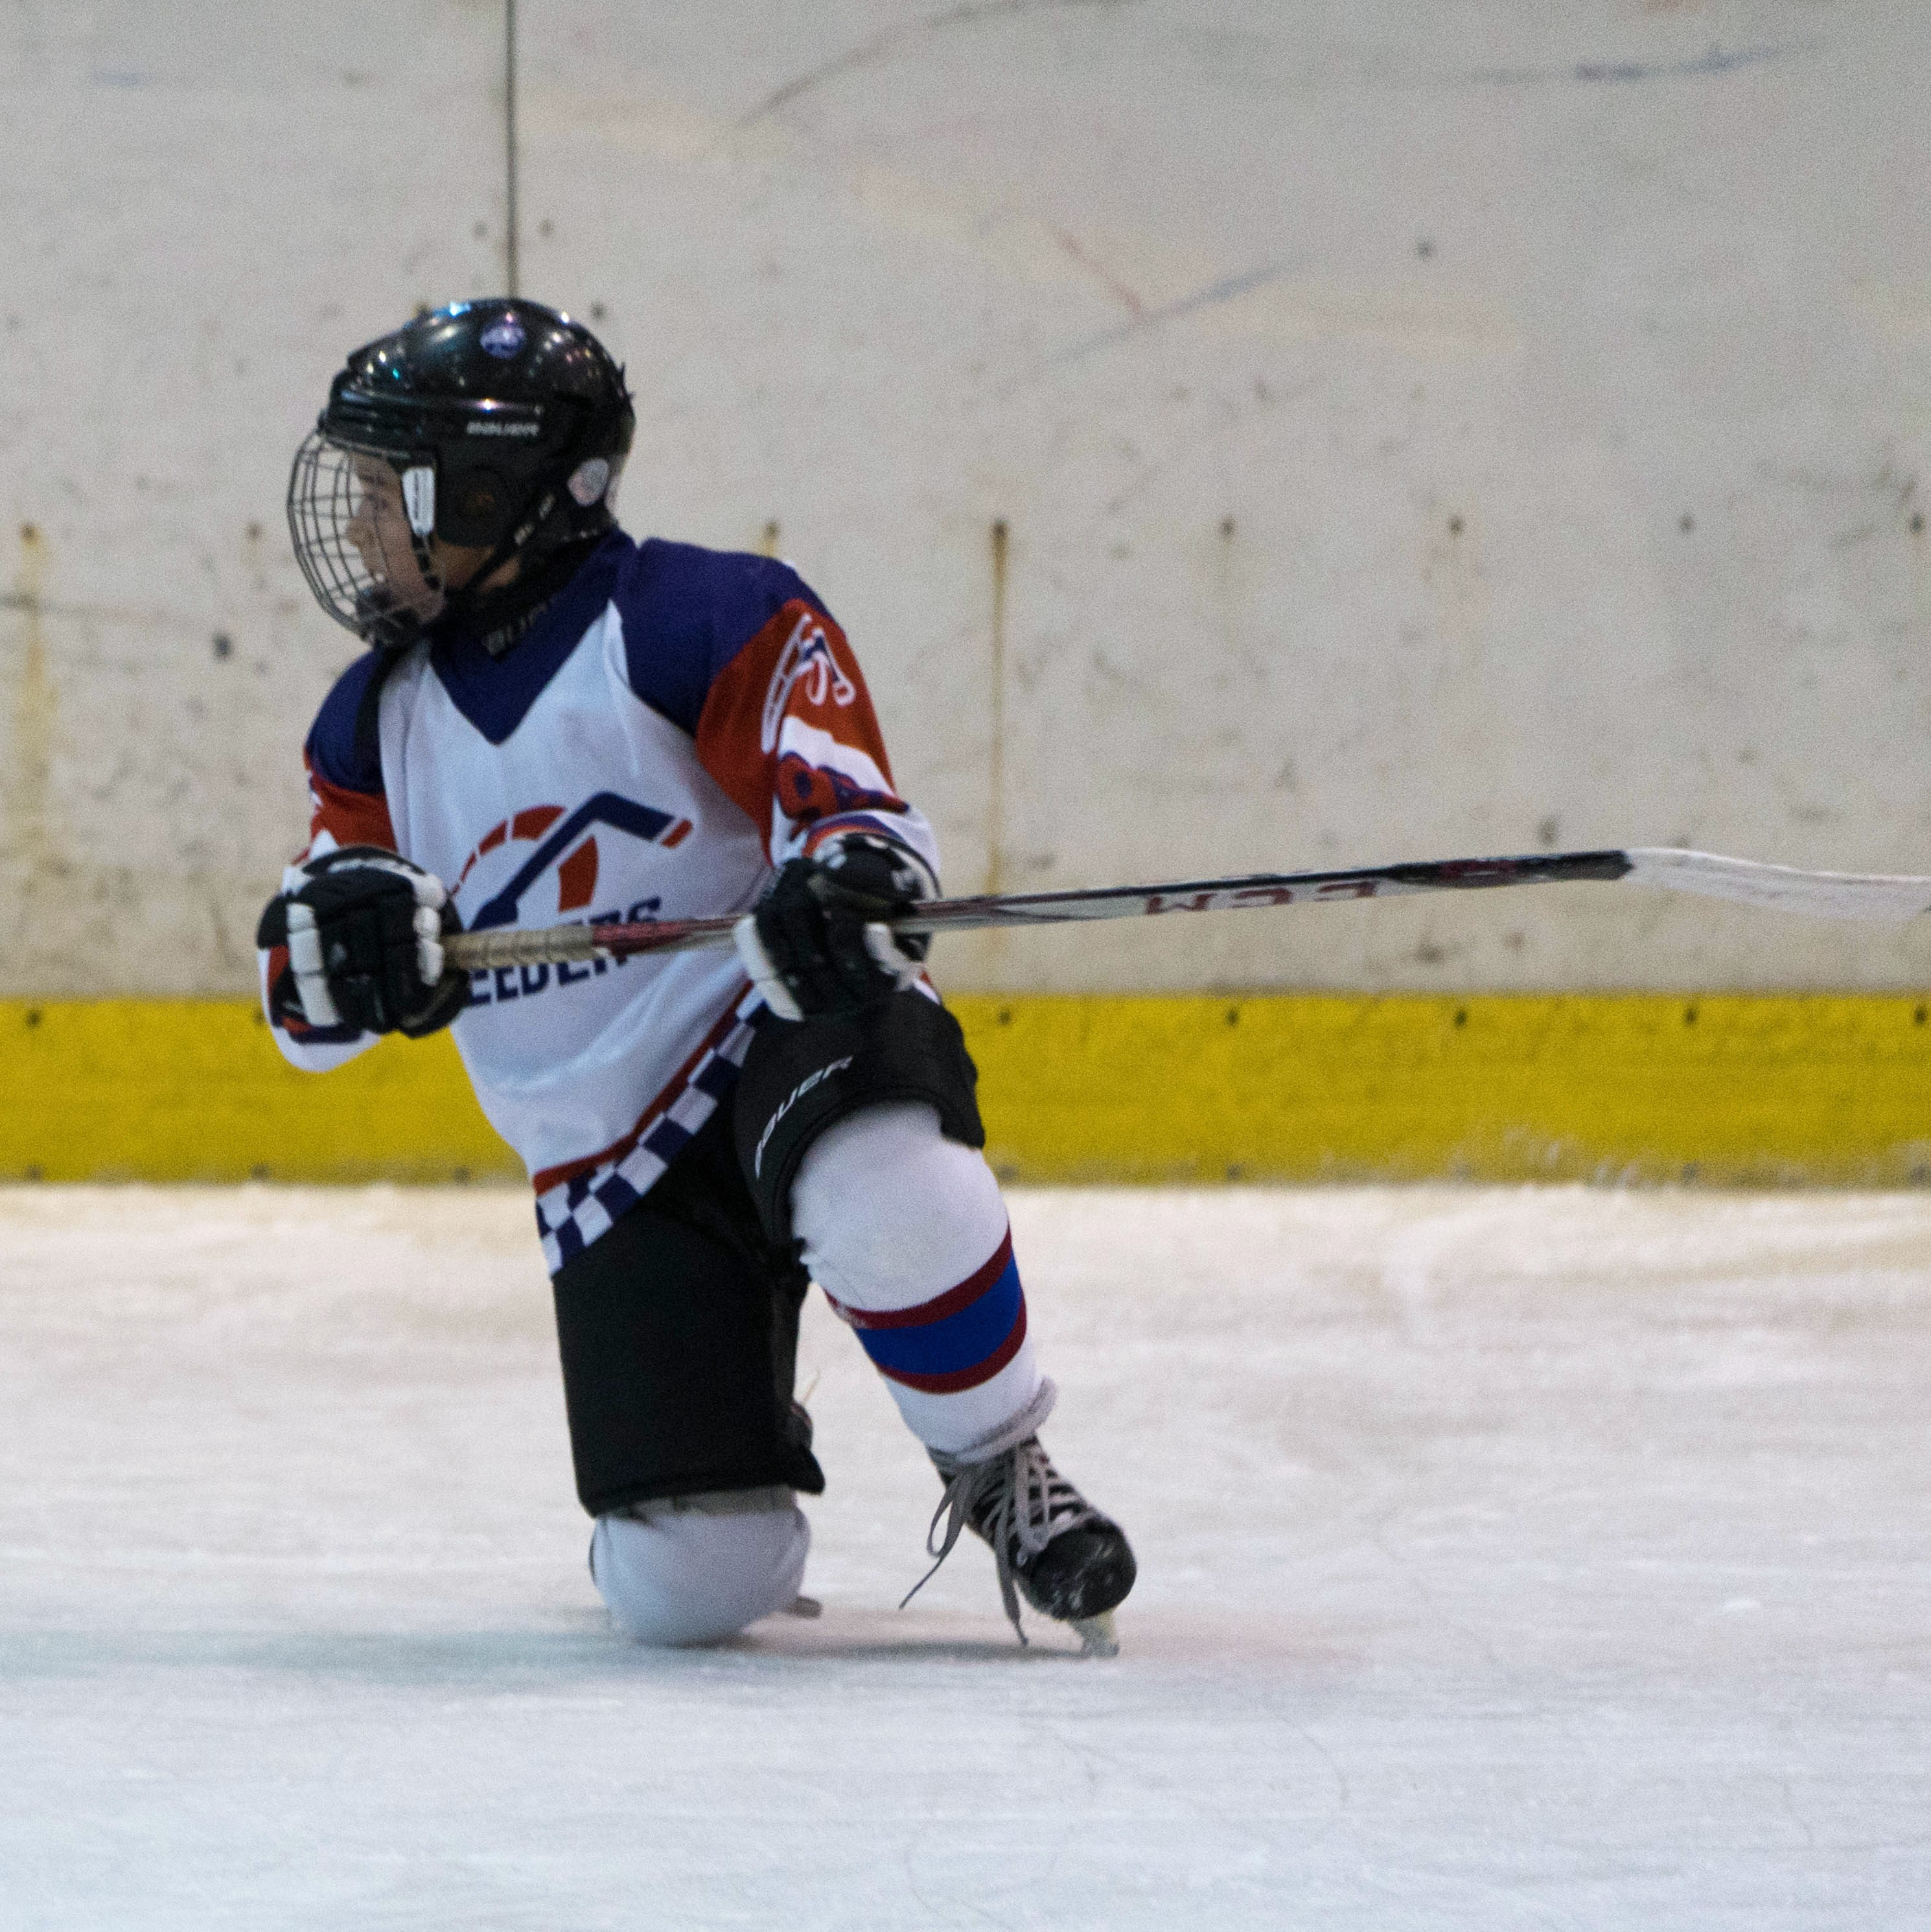 Speeders_sezona 2018_19 hokej turnaj lucenec 9